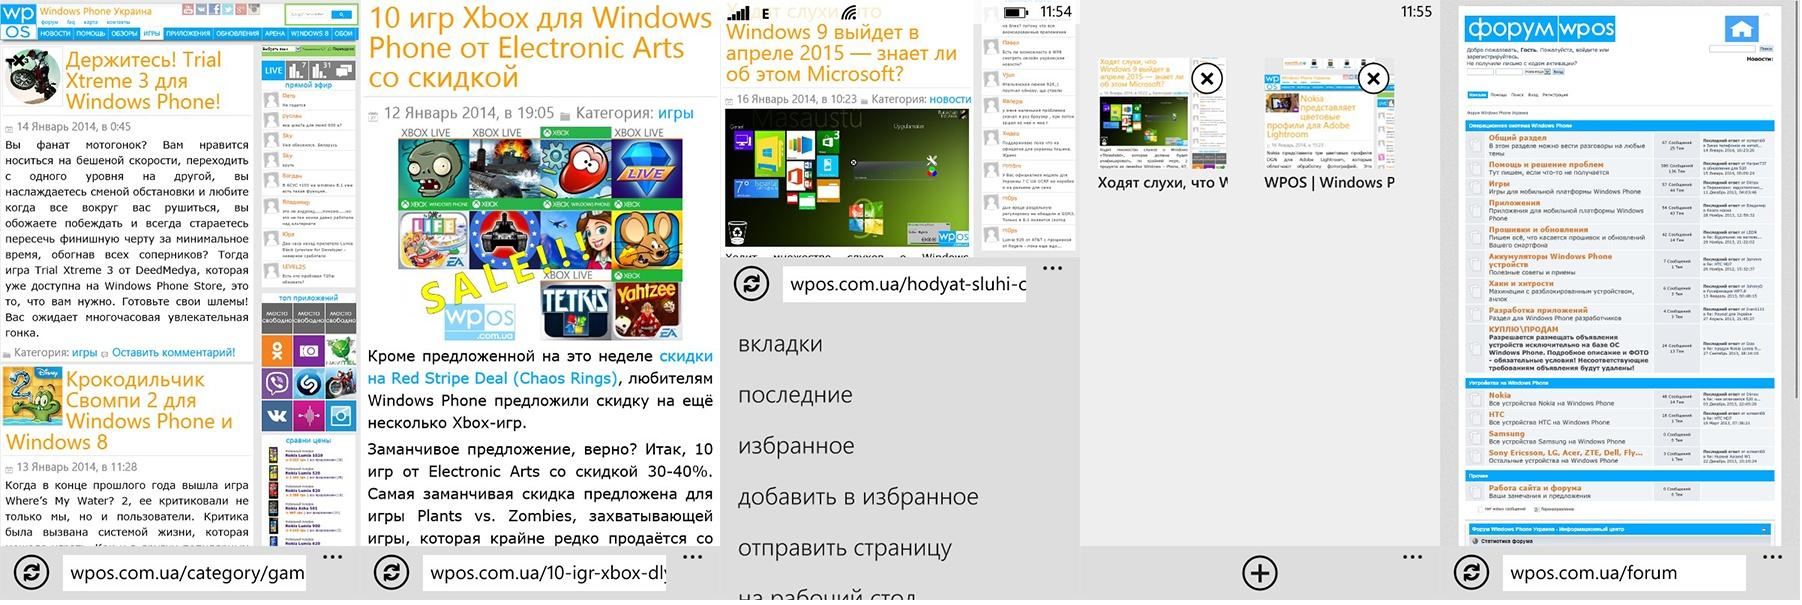 Nokia lumia 625 Интернет